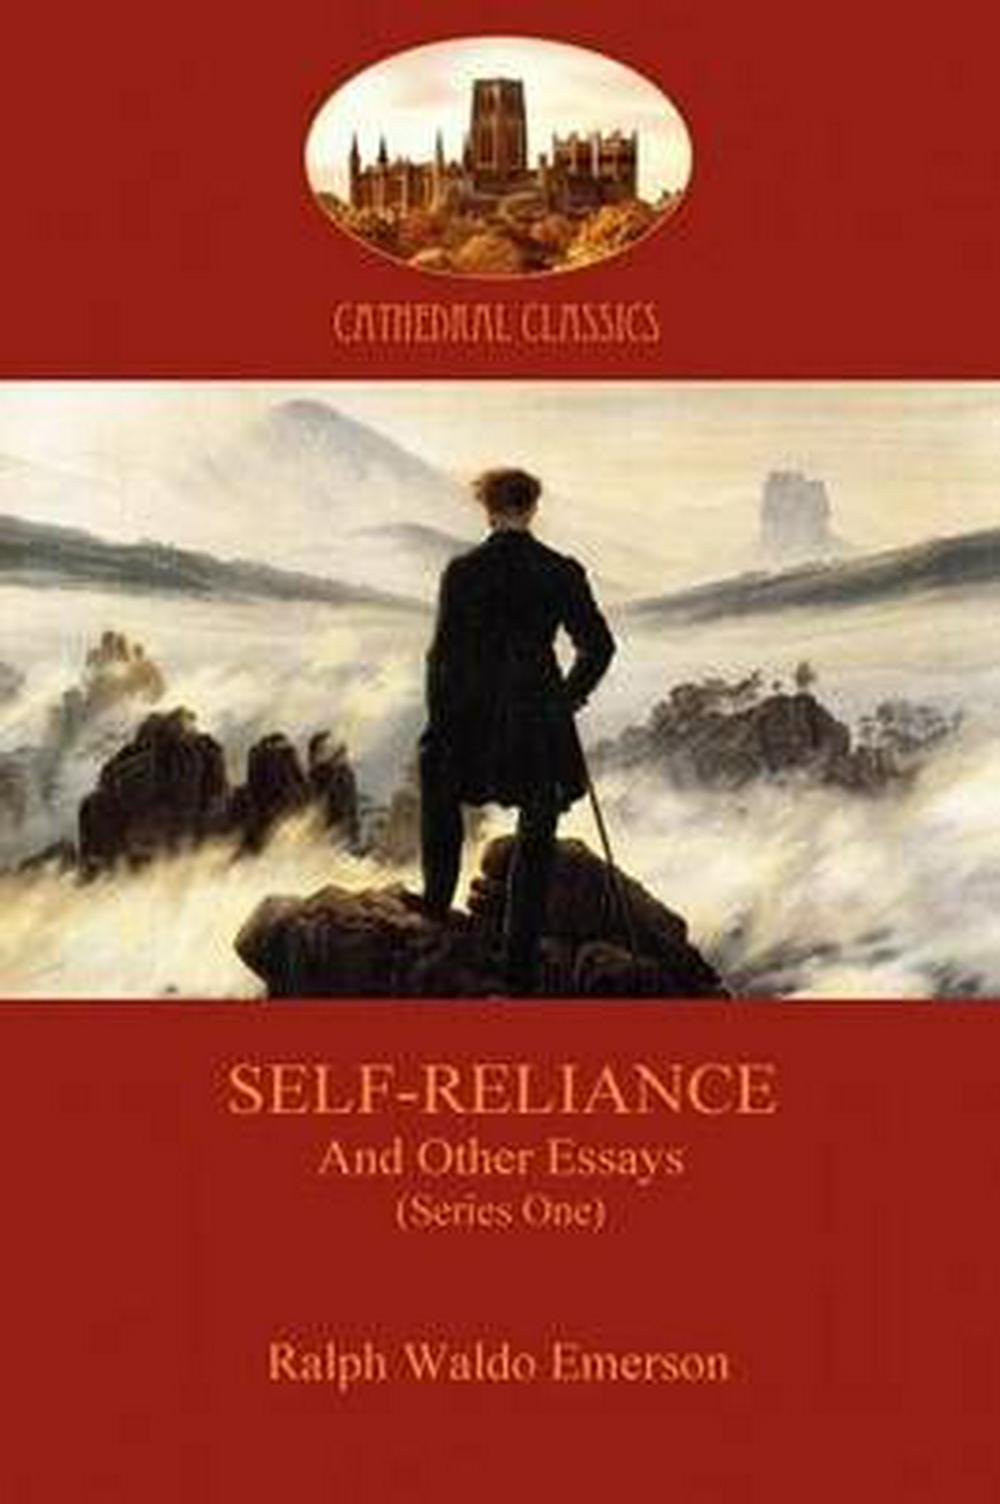 015 Essay Example Self Reliance And Other Essays Formidable Ralph Waldo Emerson Pdf Ekşi Full